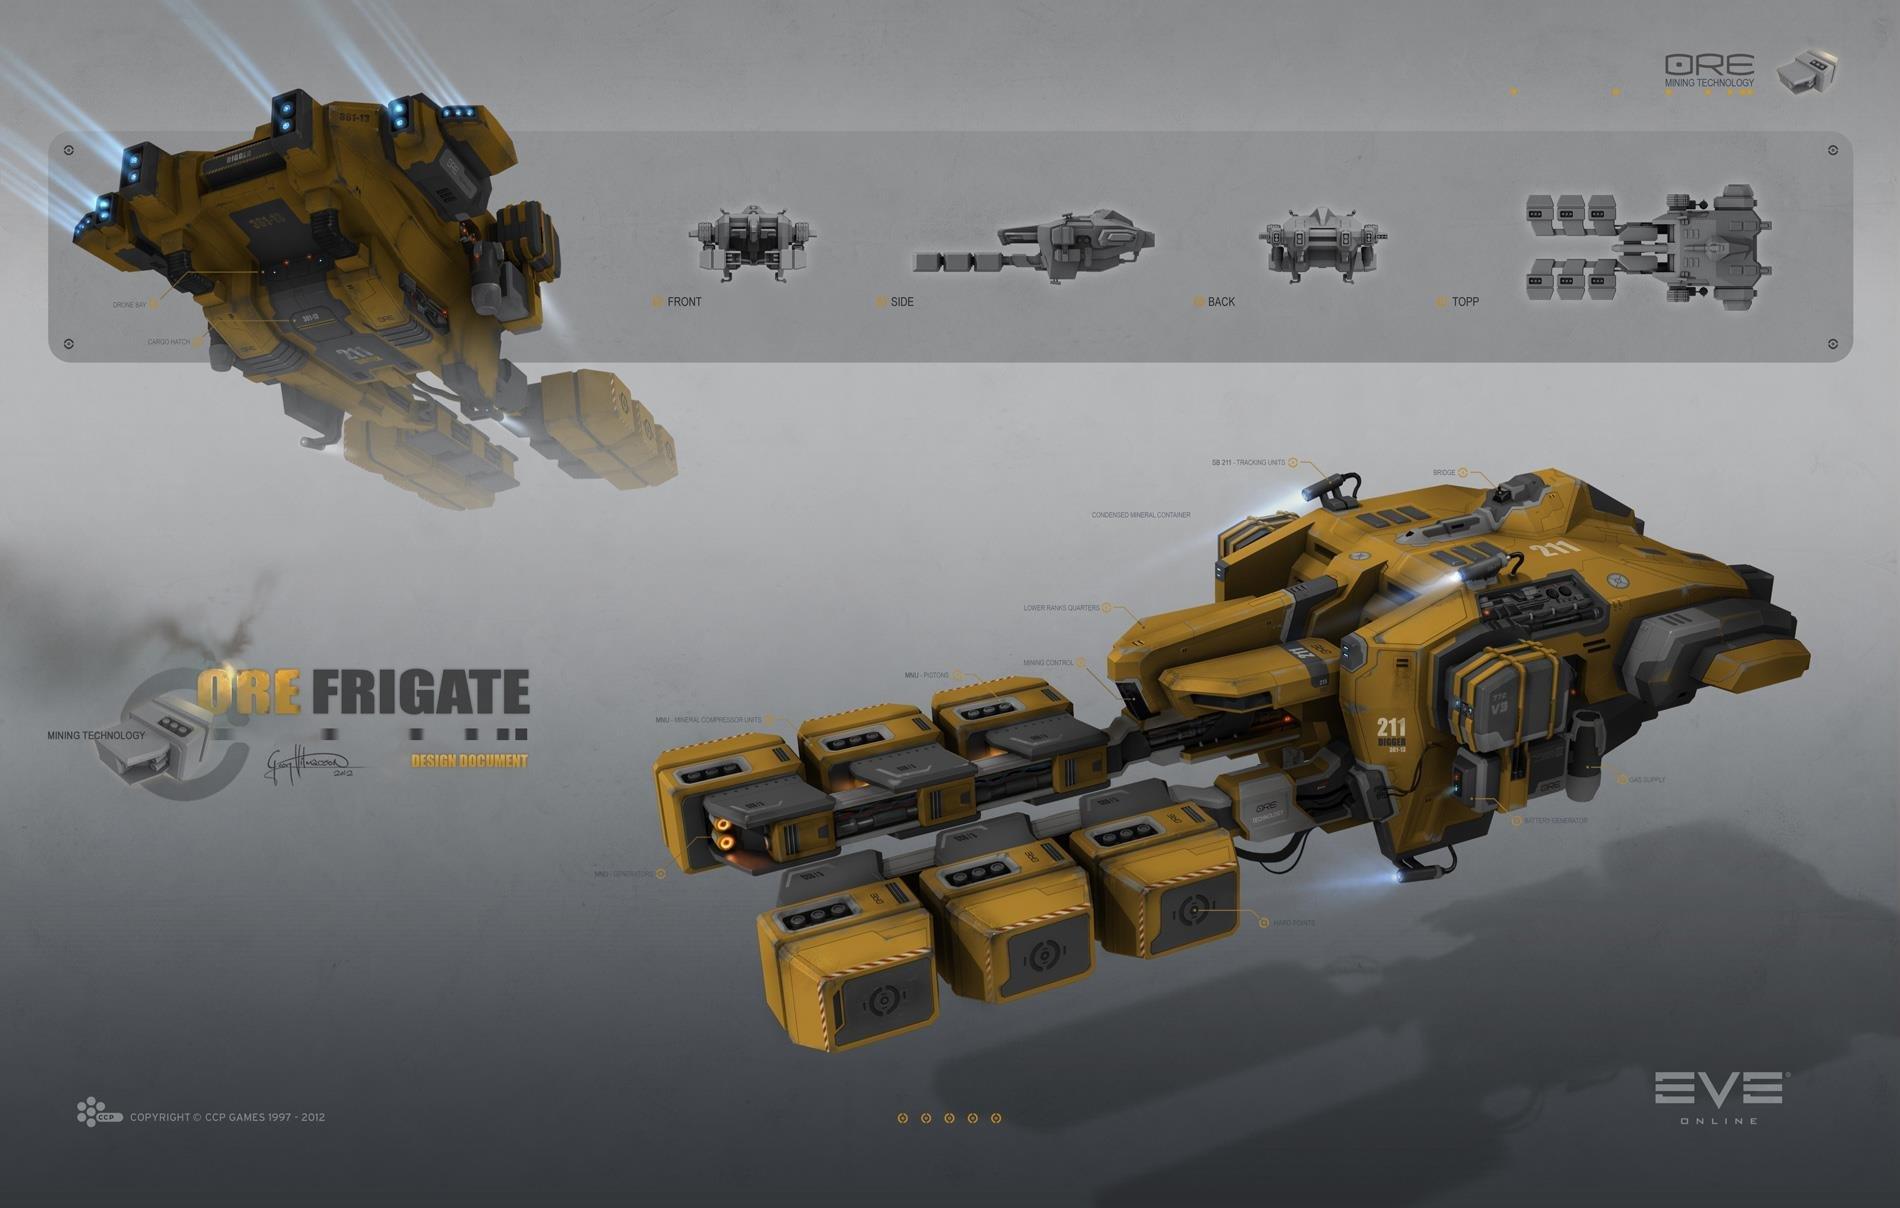 mining frigate venture concept for eve online [ 1900 x 1208 Pixel ]